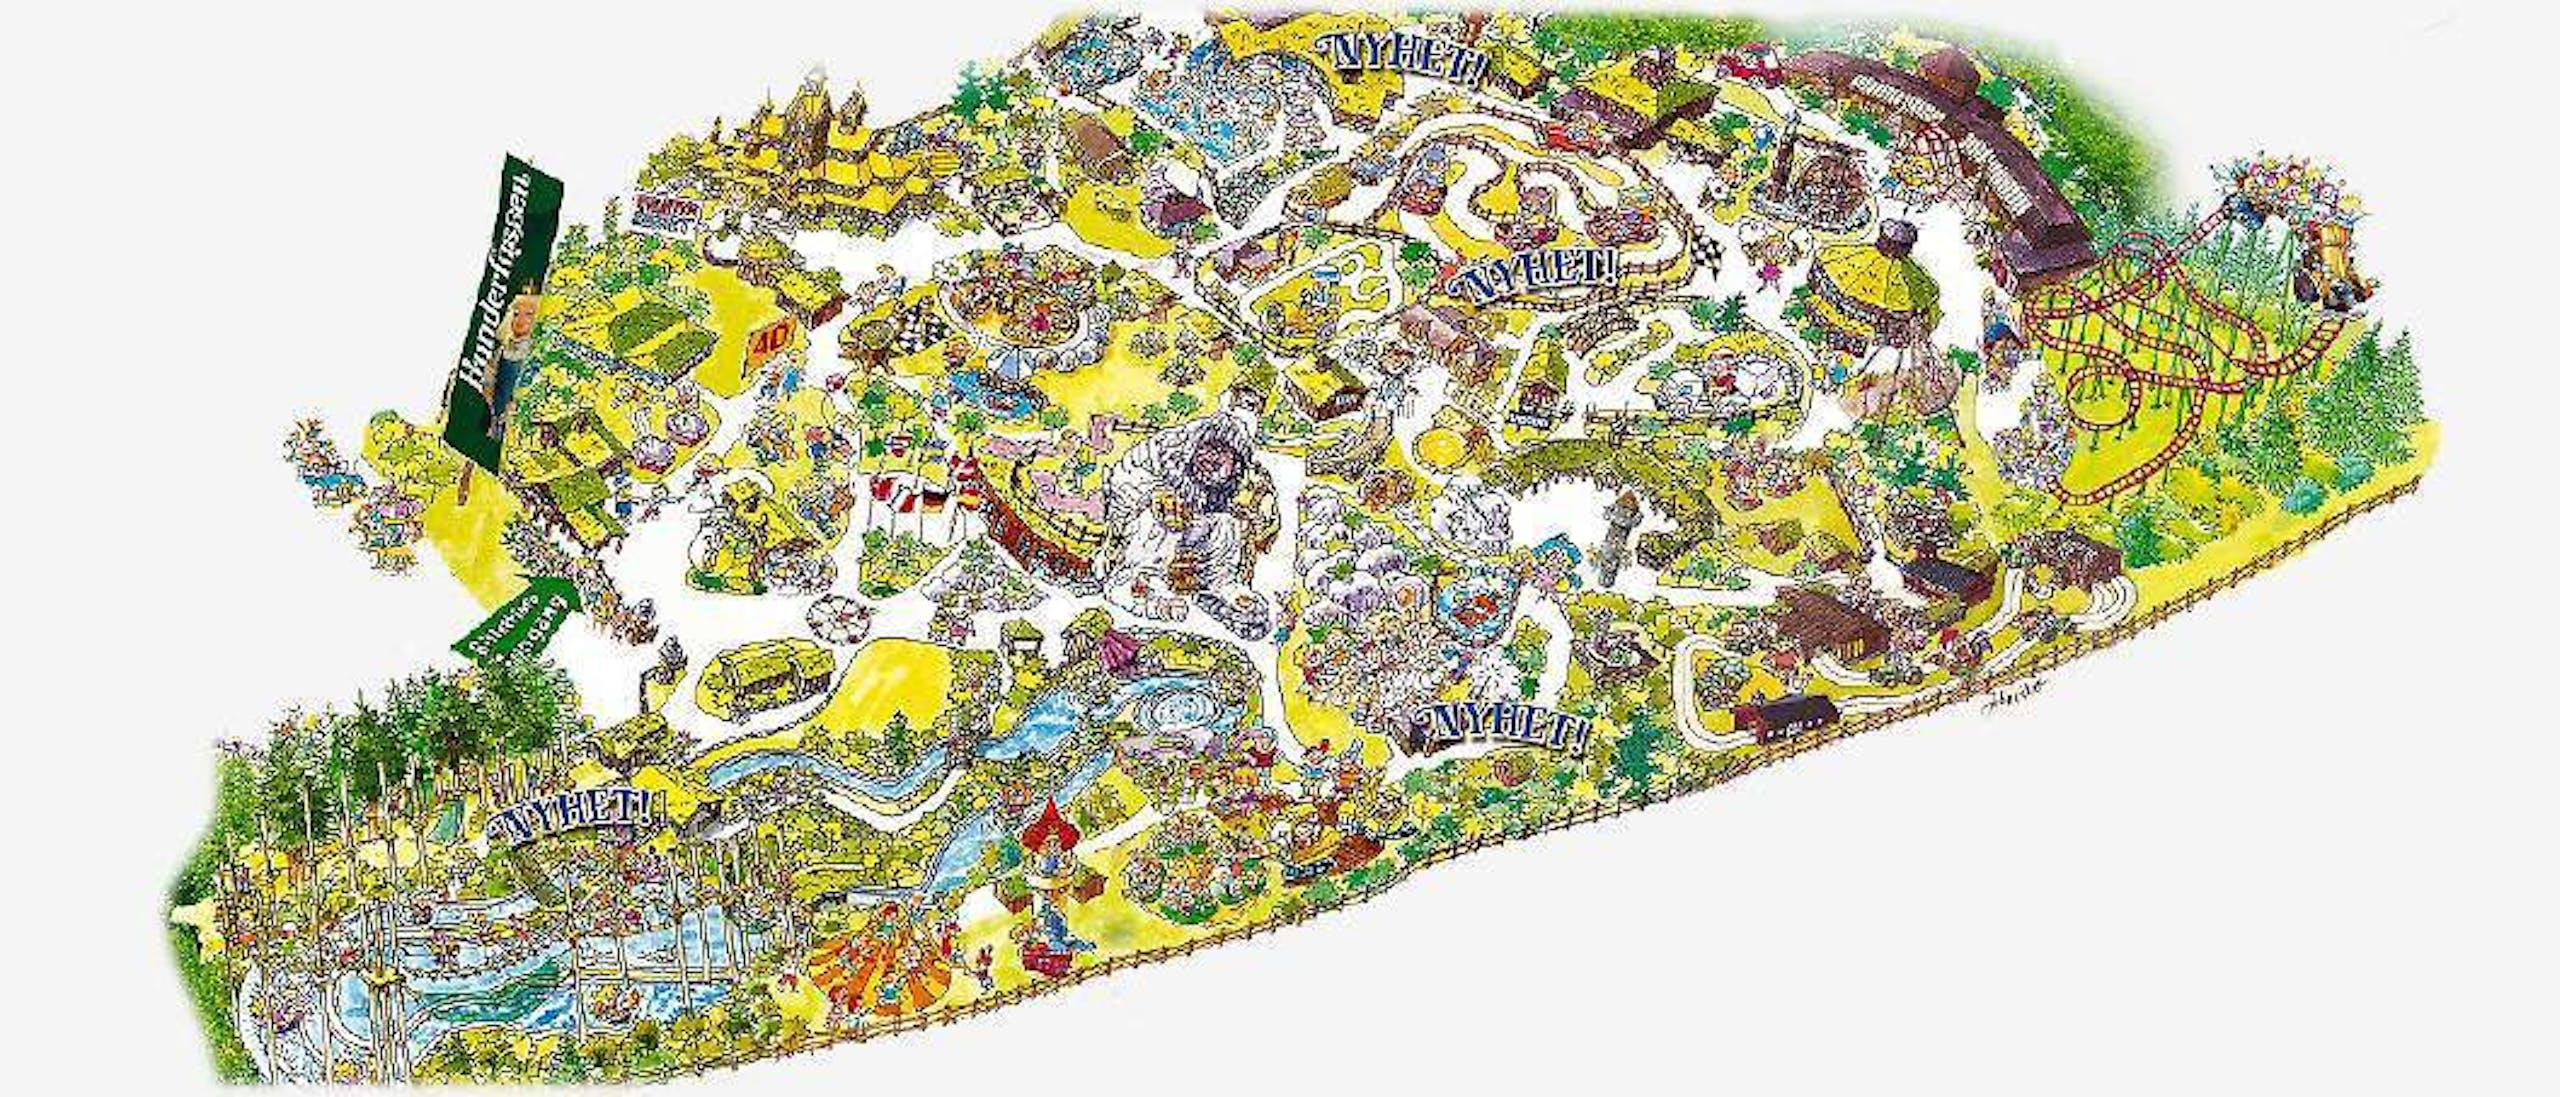 Parkkart  Hunderfossen